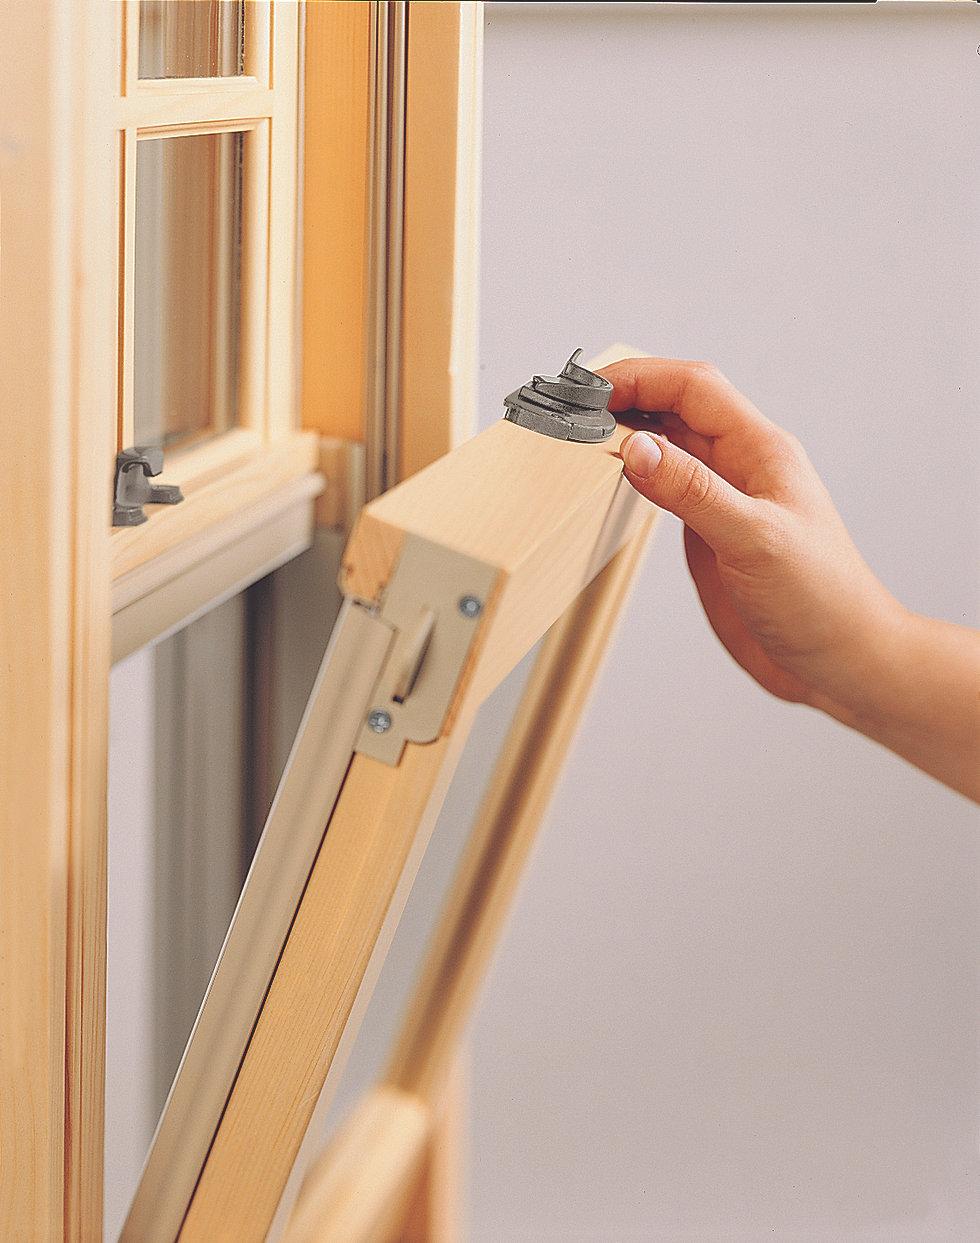 Ahsap giyotin pencere for Marvin single hung windows